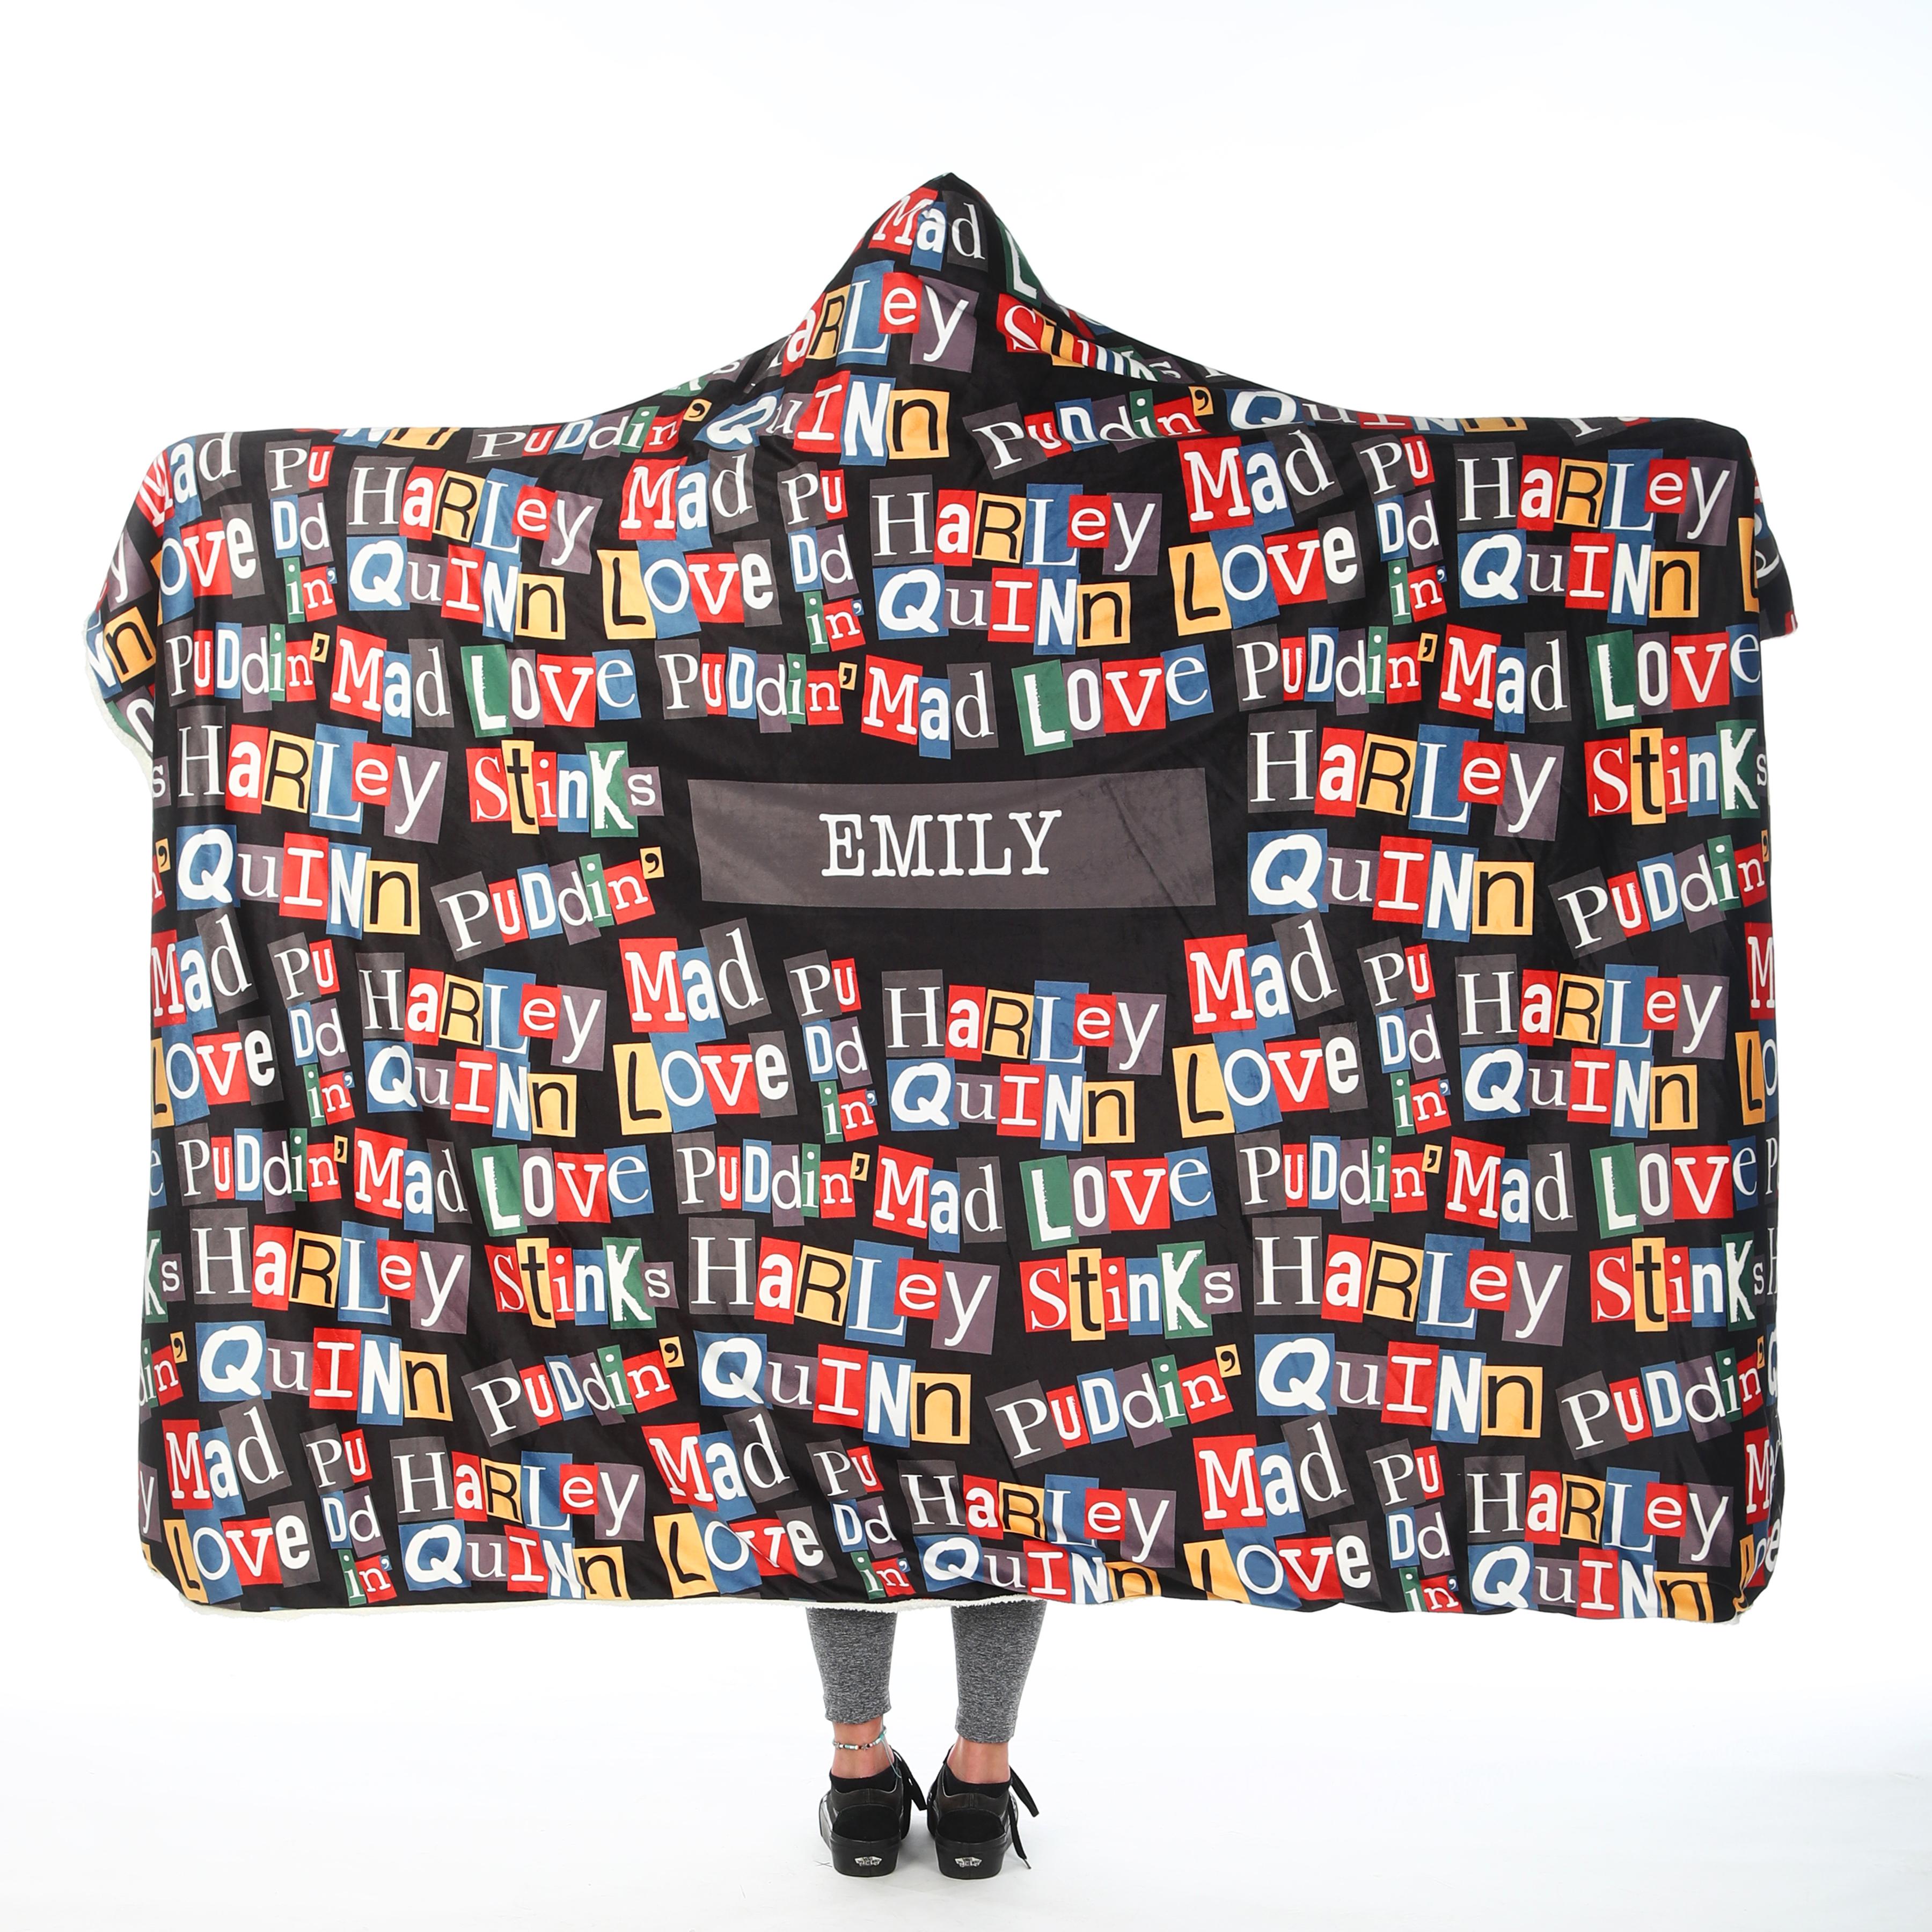 Harley Quinn™ Adult Hooded Blanket - Pattern